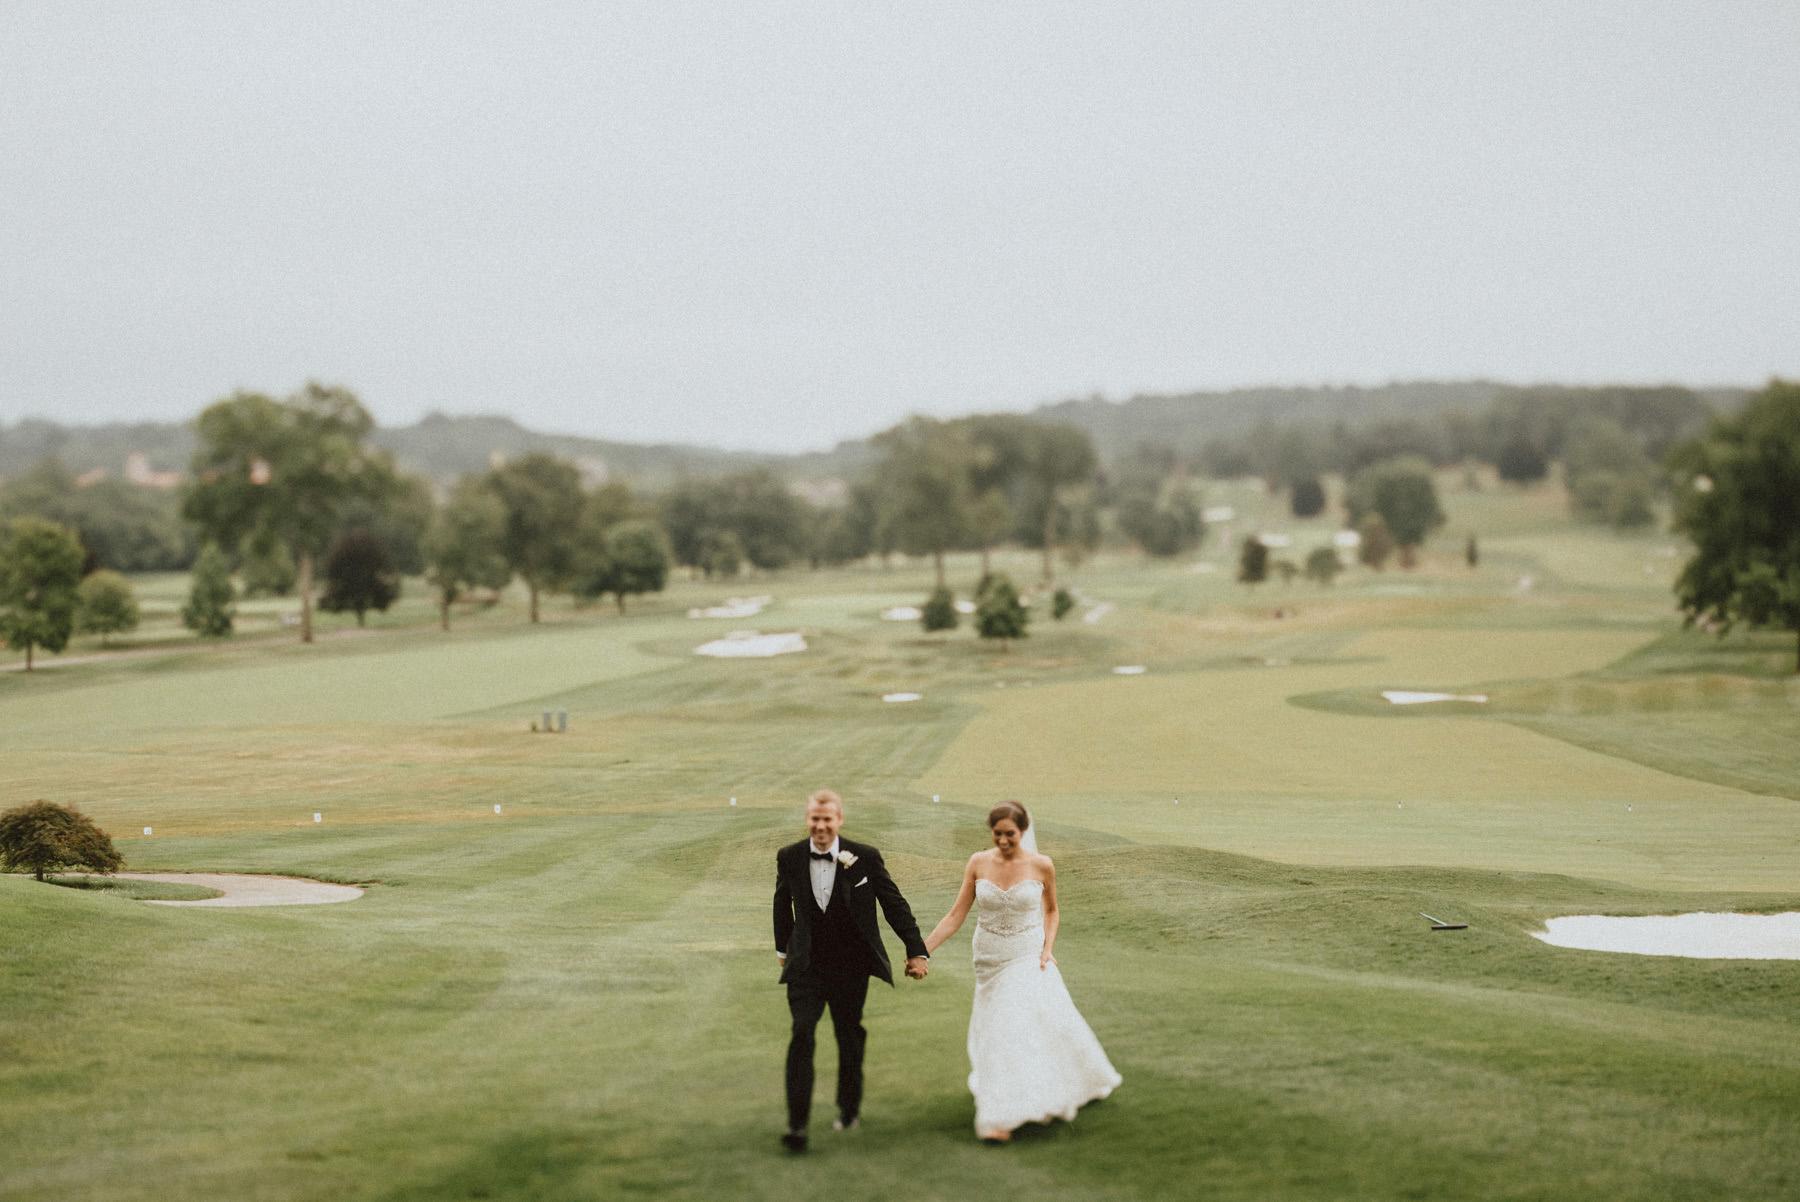 056-whitemarsh-valley-country-club-wedding-19.jpg